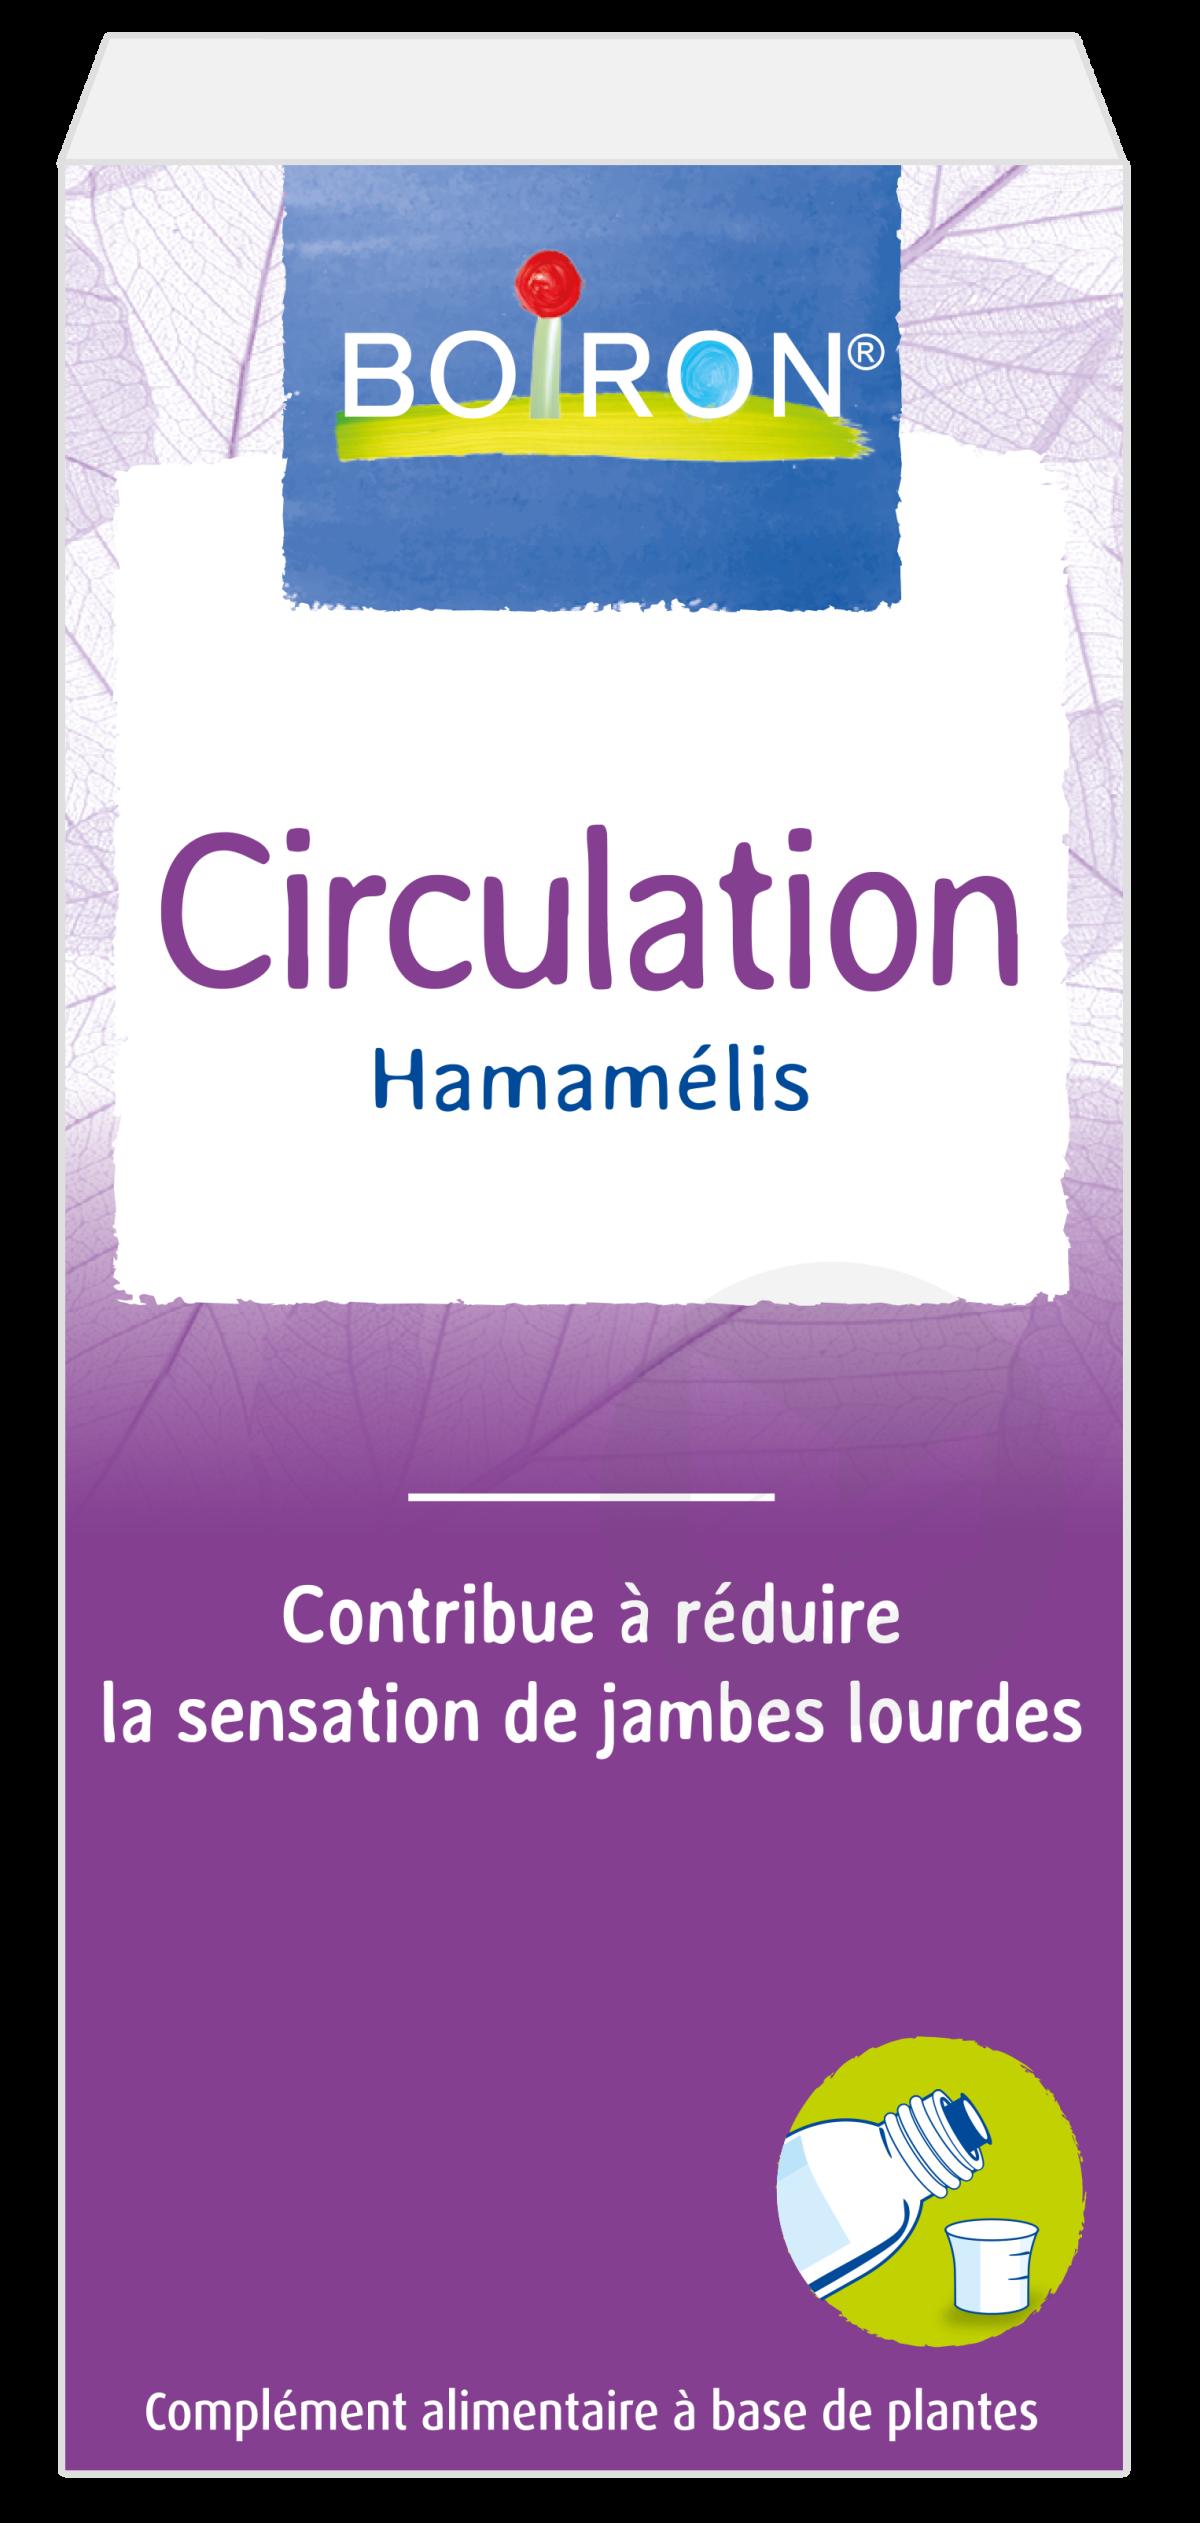 Extrait De Plantes Circulation Hamamelis 60 Ml